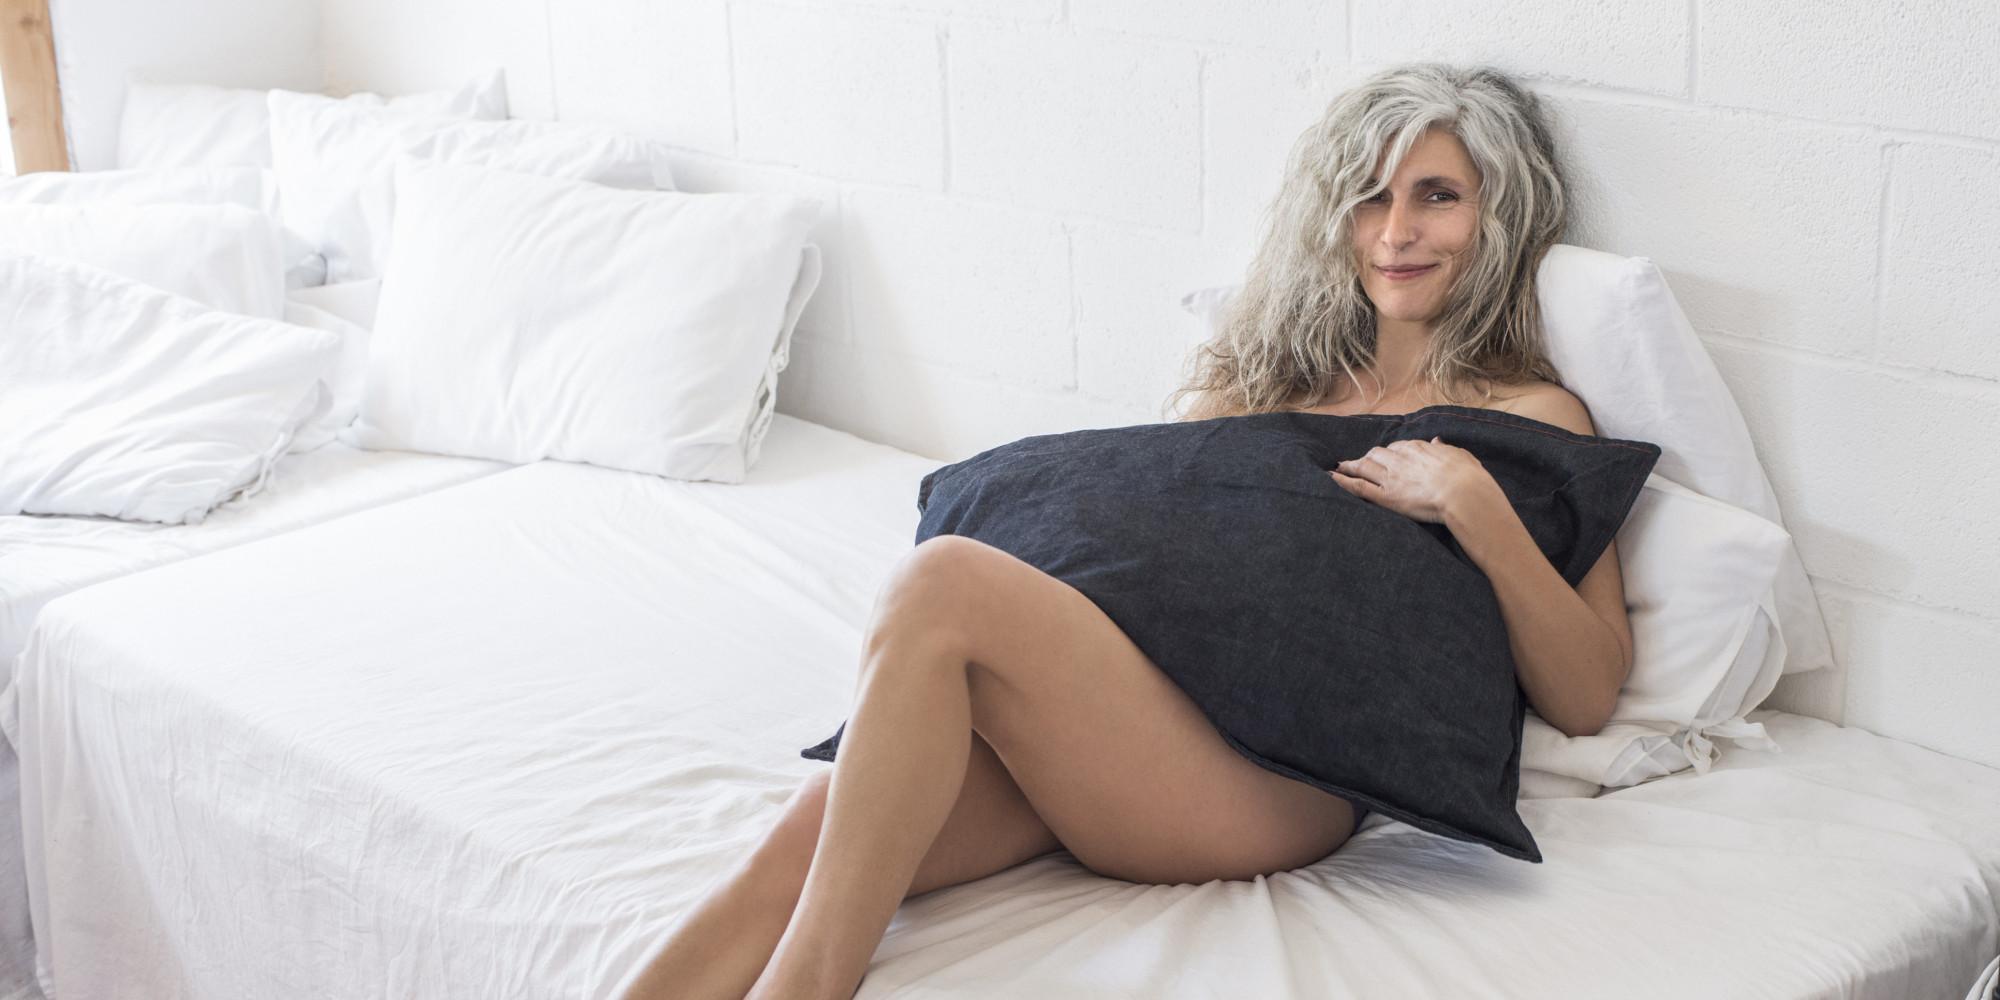 50 To 55 Blond Fling Woman Seeking Man